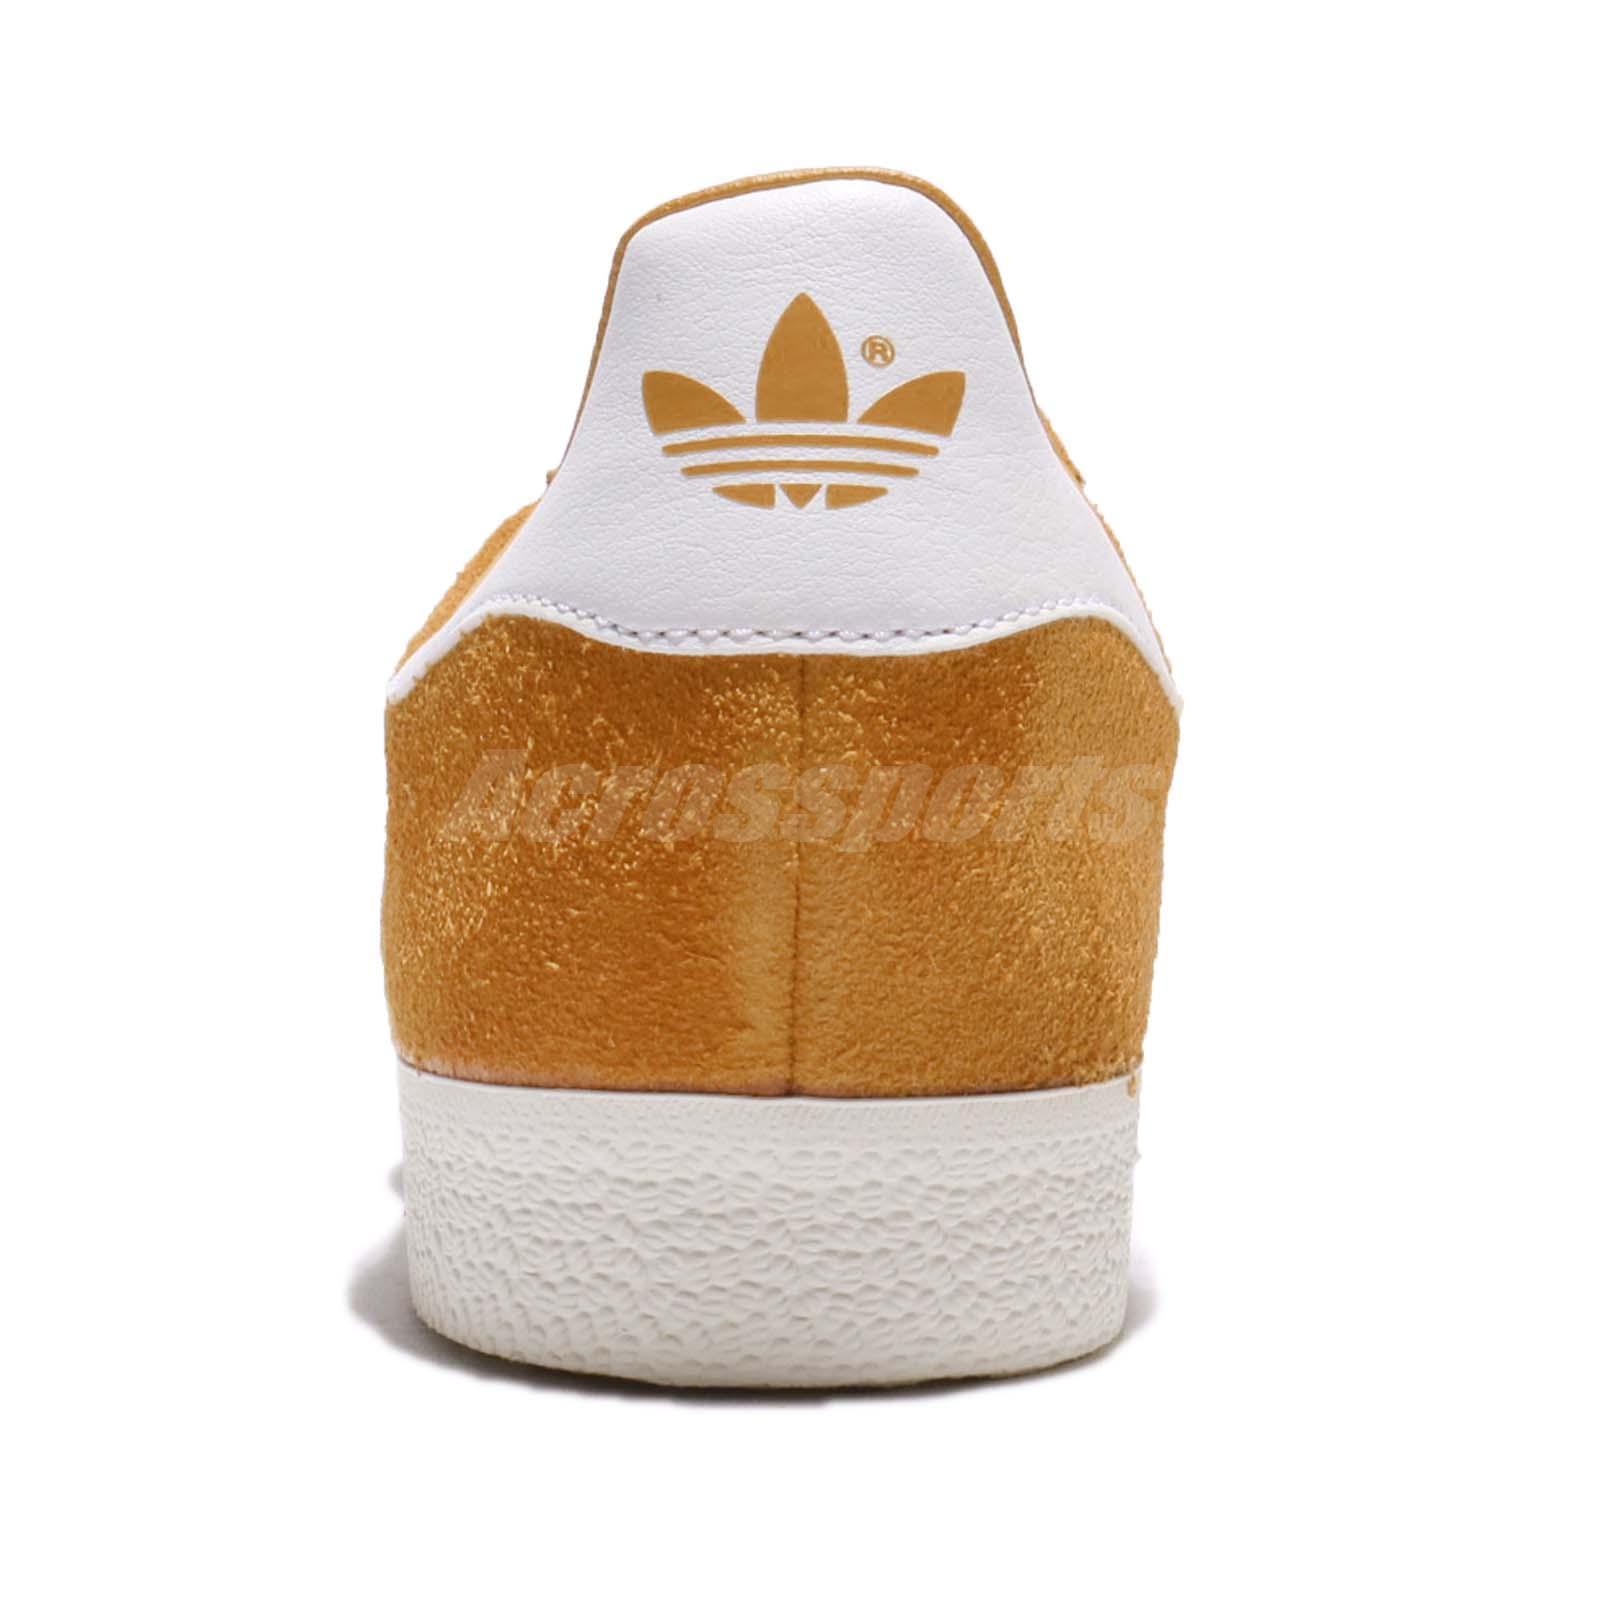 Adidas Originals Gazelle COLLEGIATE GOLD CREAM blanco hombre zapatos